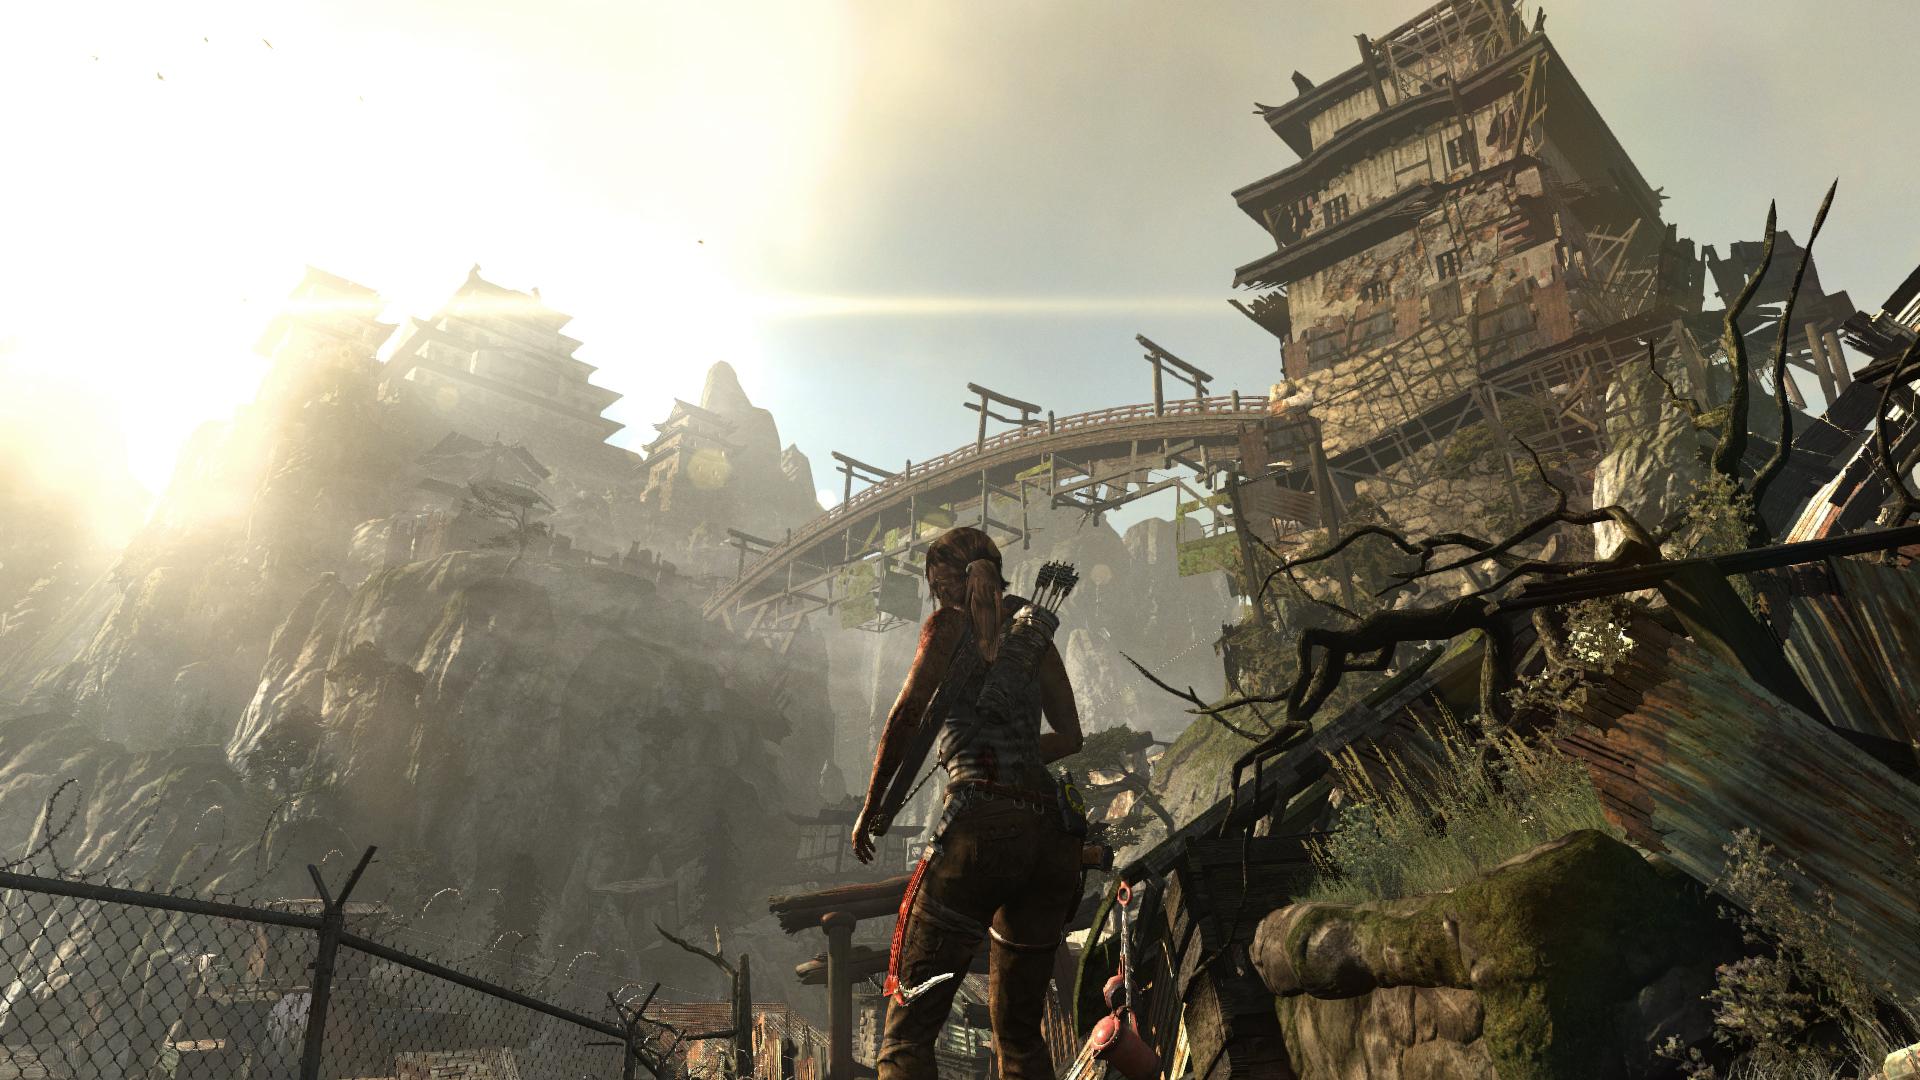 Tomb Raider Screenshots Explore Temple, Fight Samurai #25778